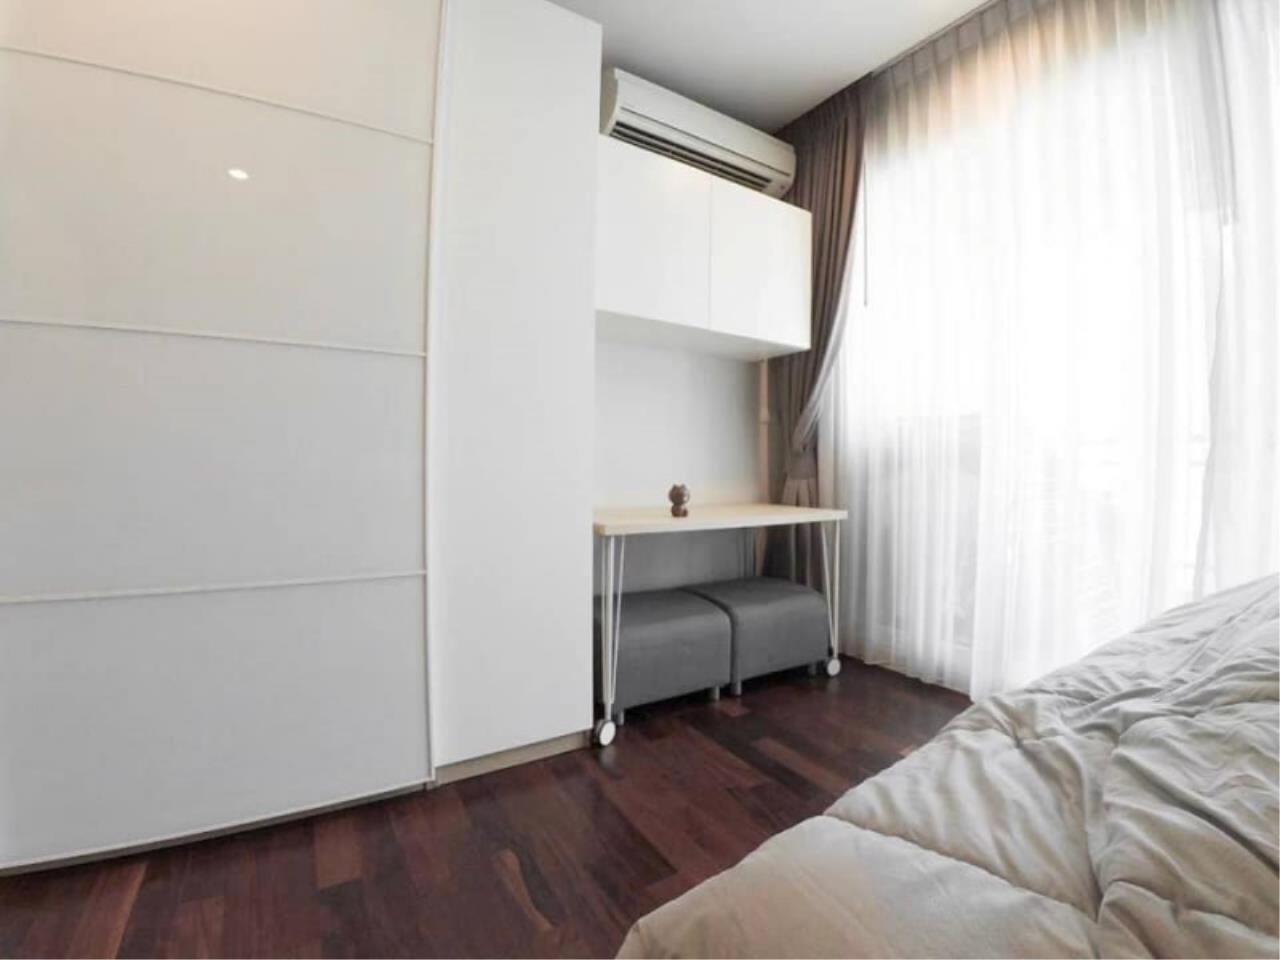 Century21 Skylux Agency's Circle Condominium / Condo For Sale / 1 Bedroom / 33.51 SQM / MRT Phetchaburi / Bangkok 7